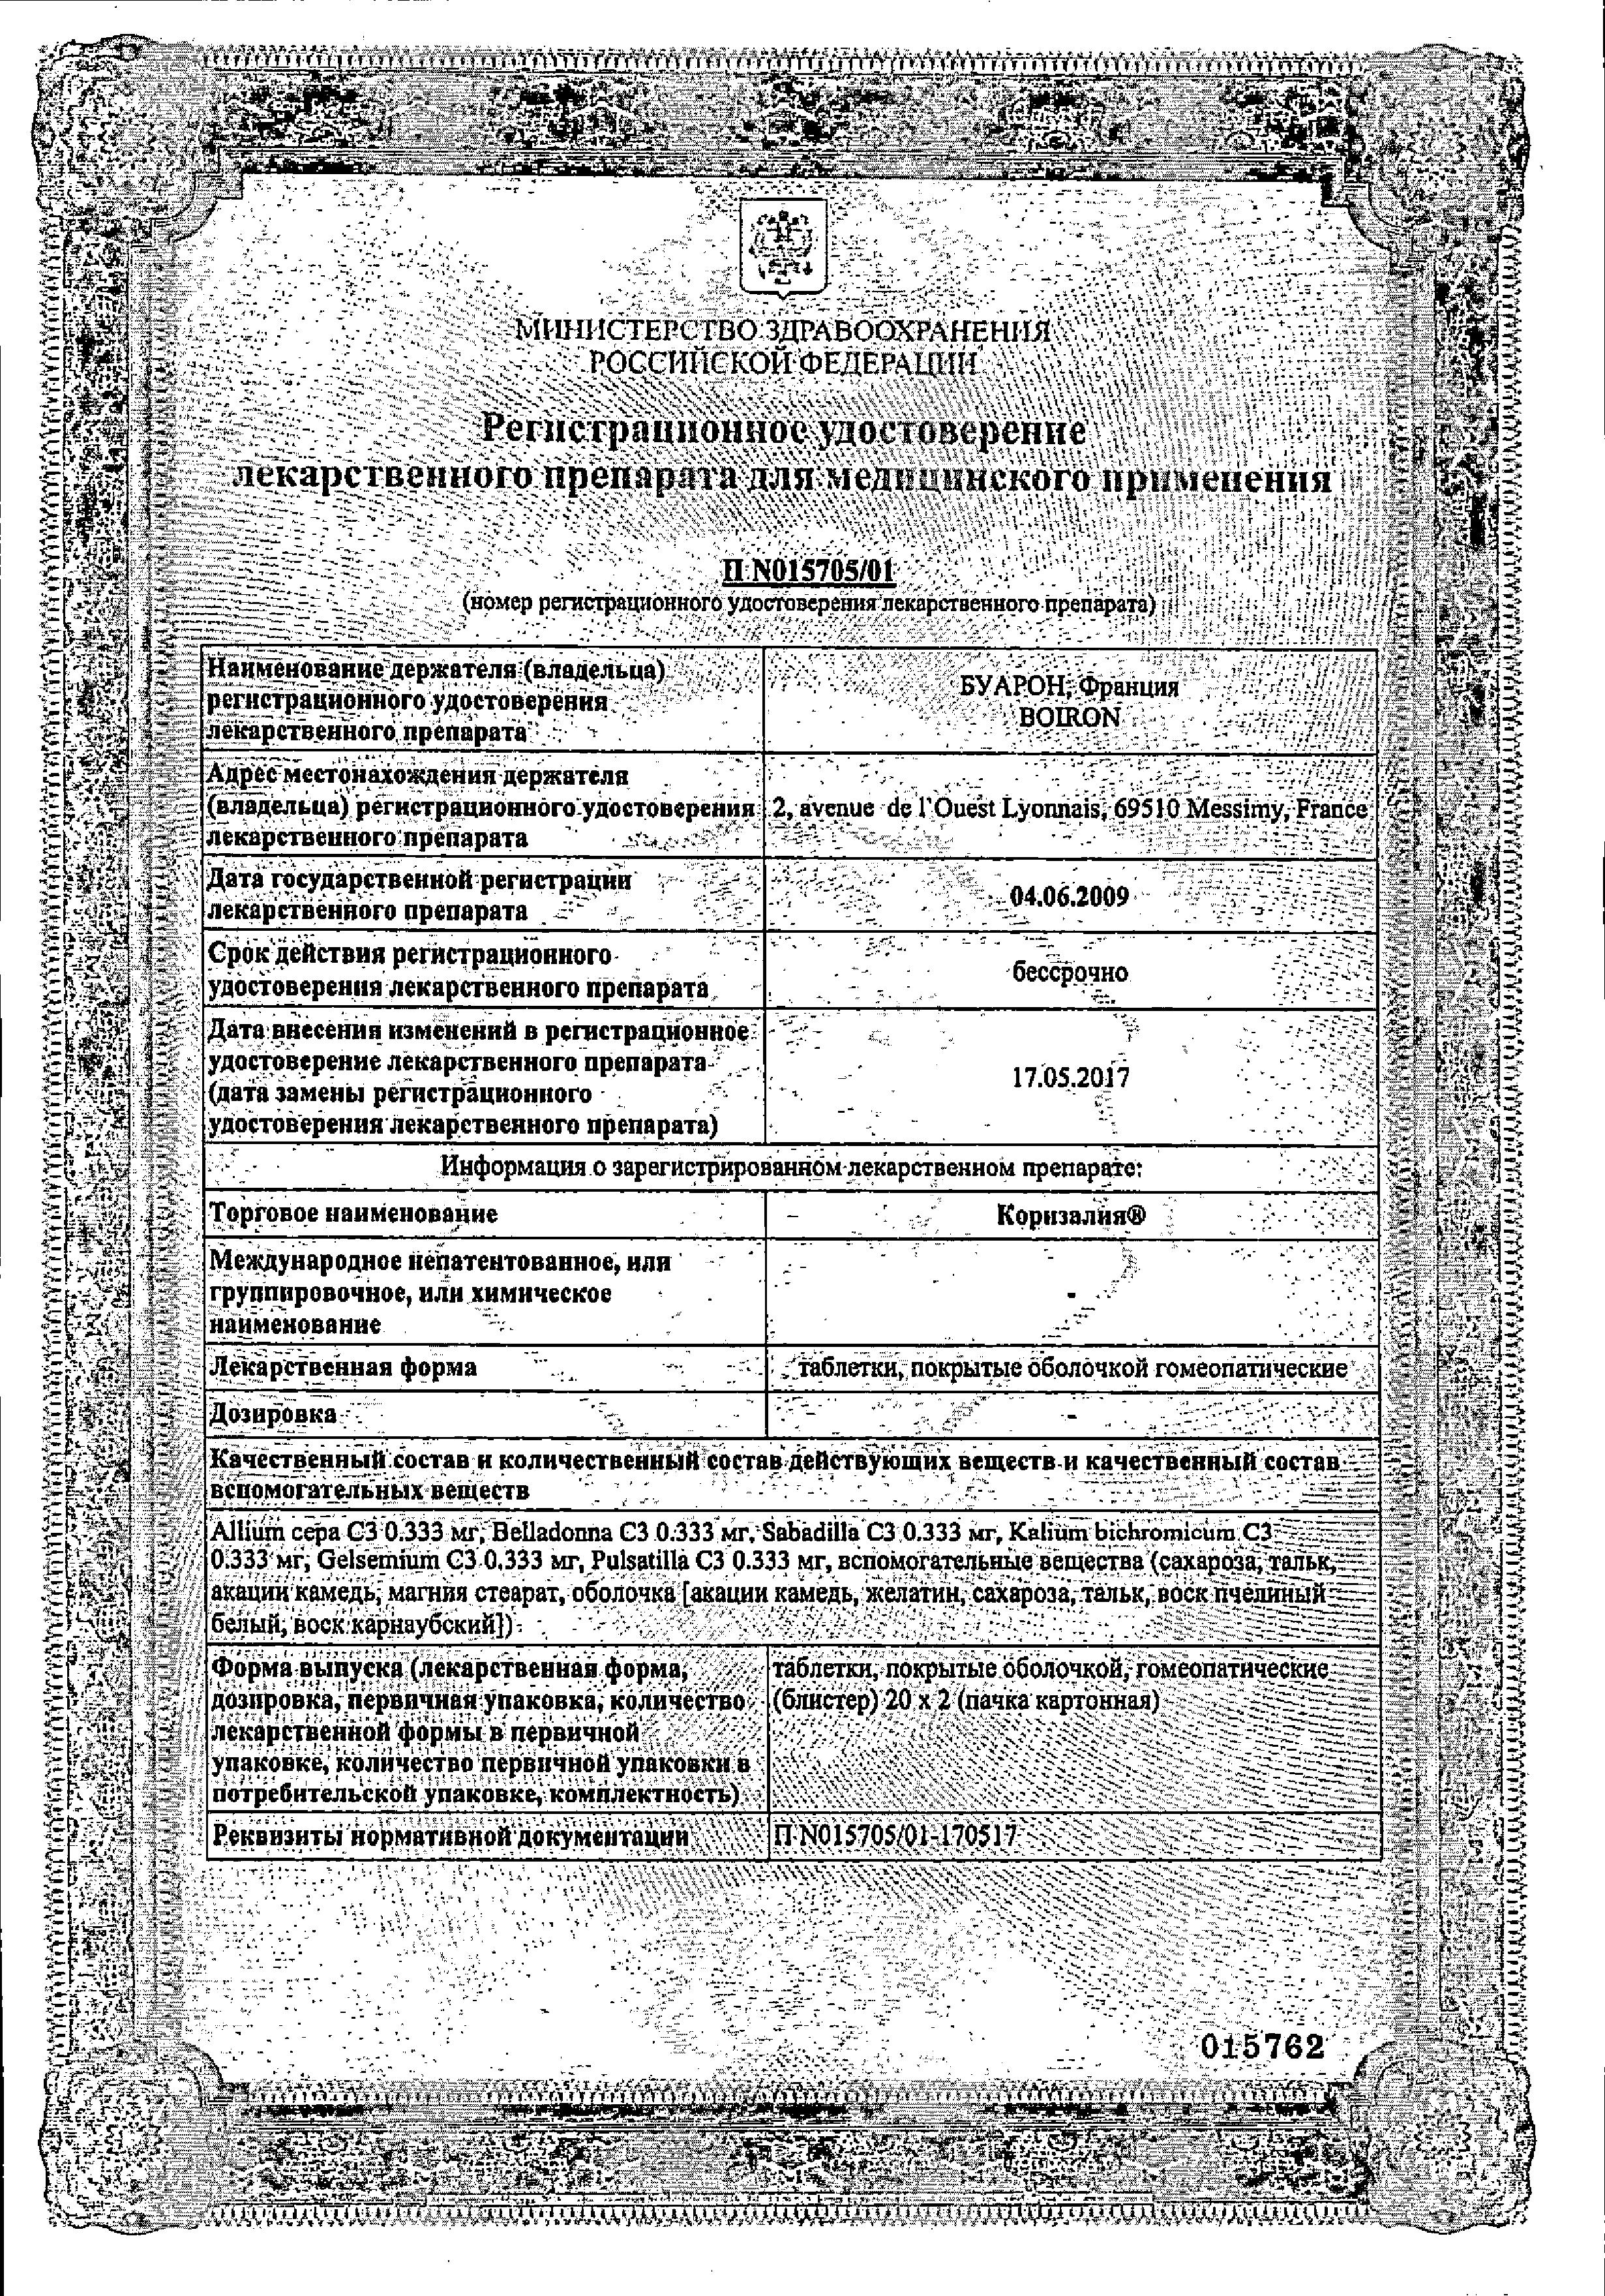 Коризалия сертификат